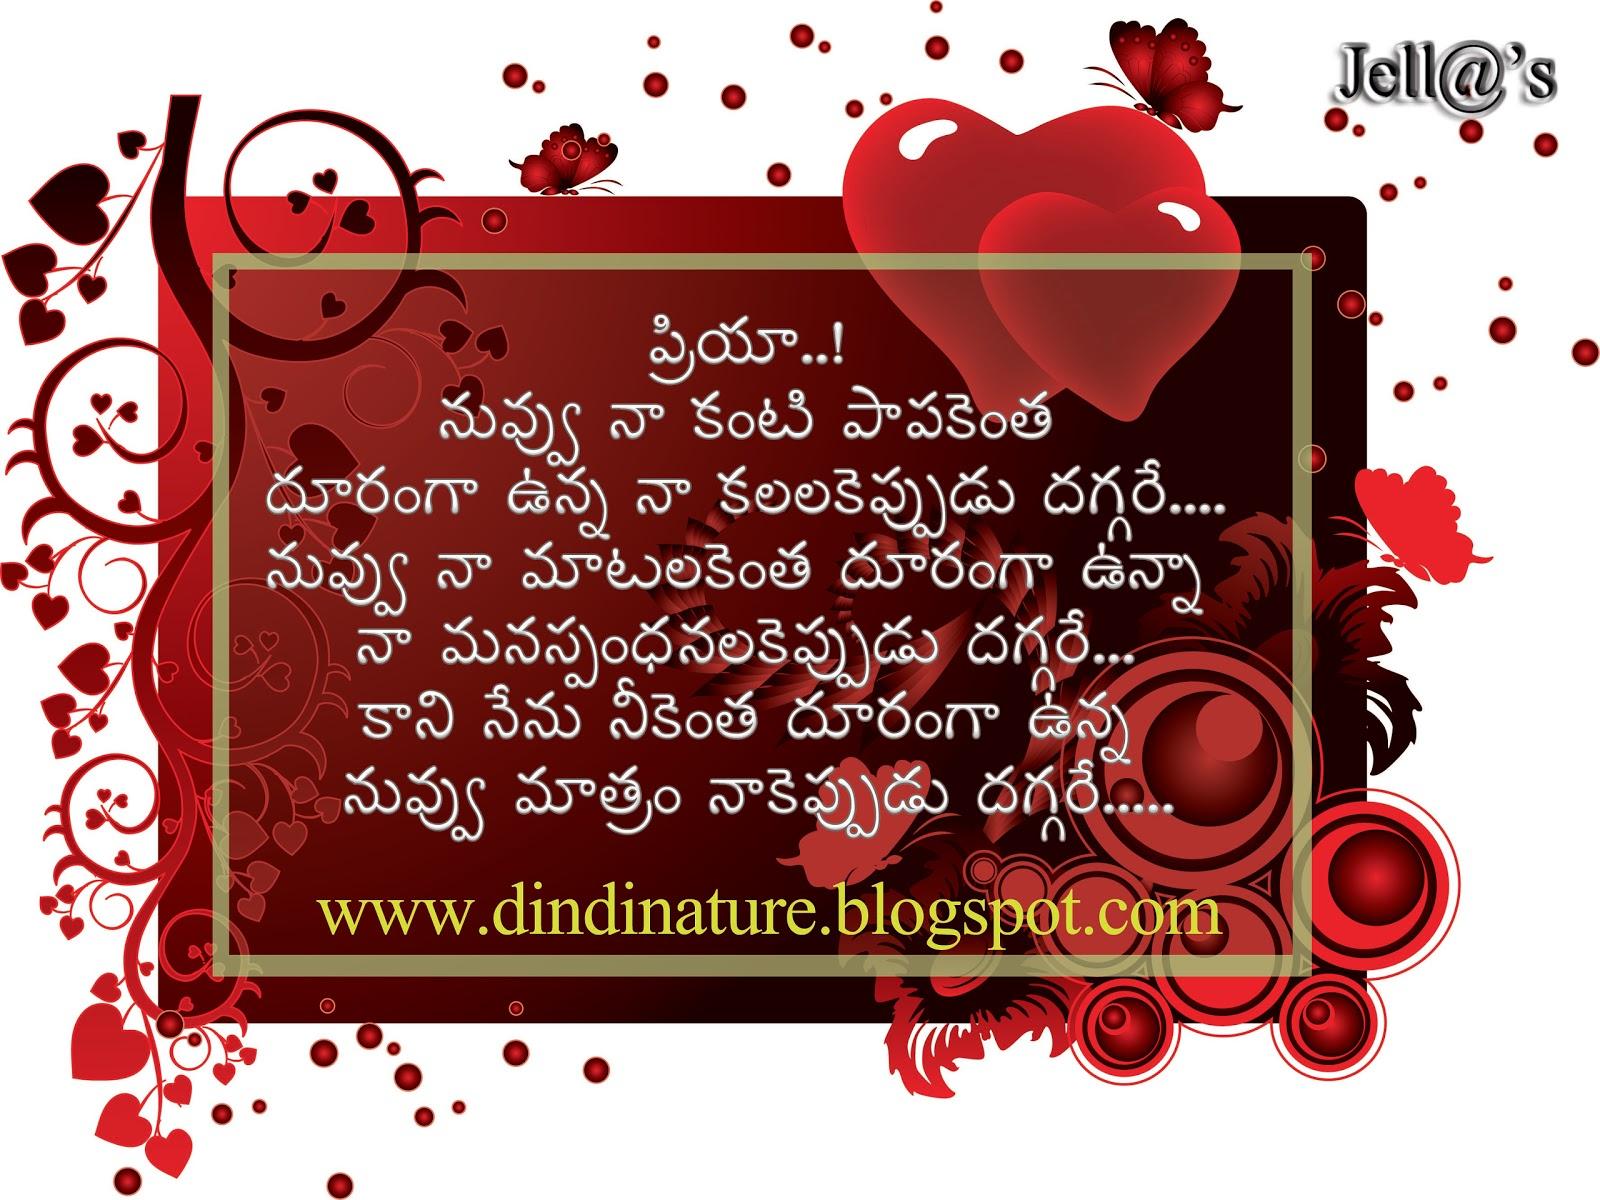 Free Wallpaper Telugu Love Quotations Priya